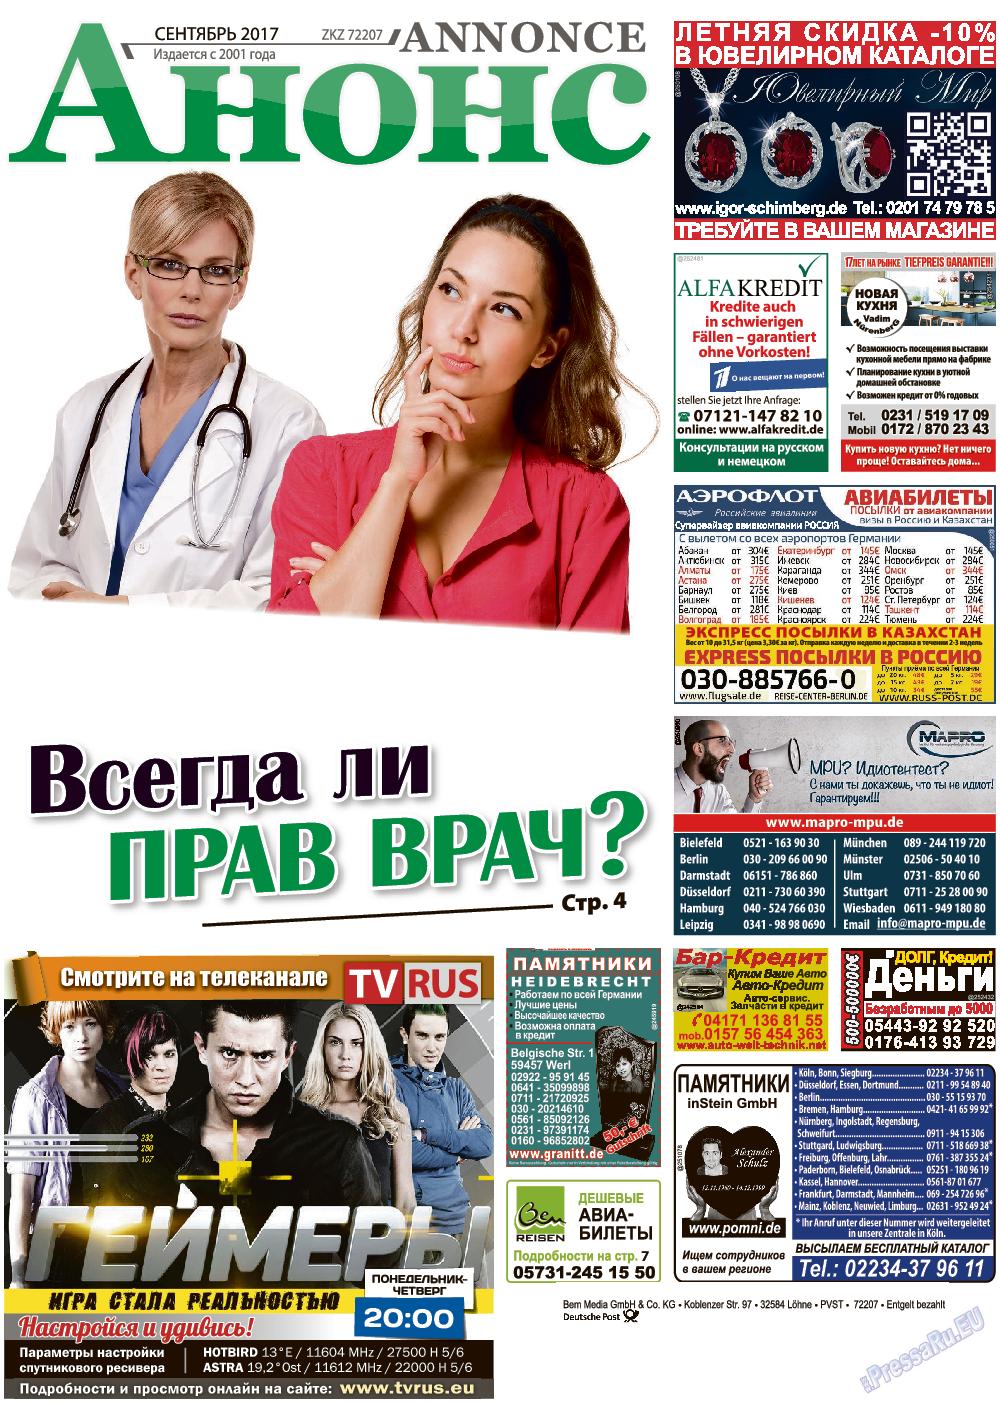 Анонс (газета). 2017 год, номер 9, стр. 1